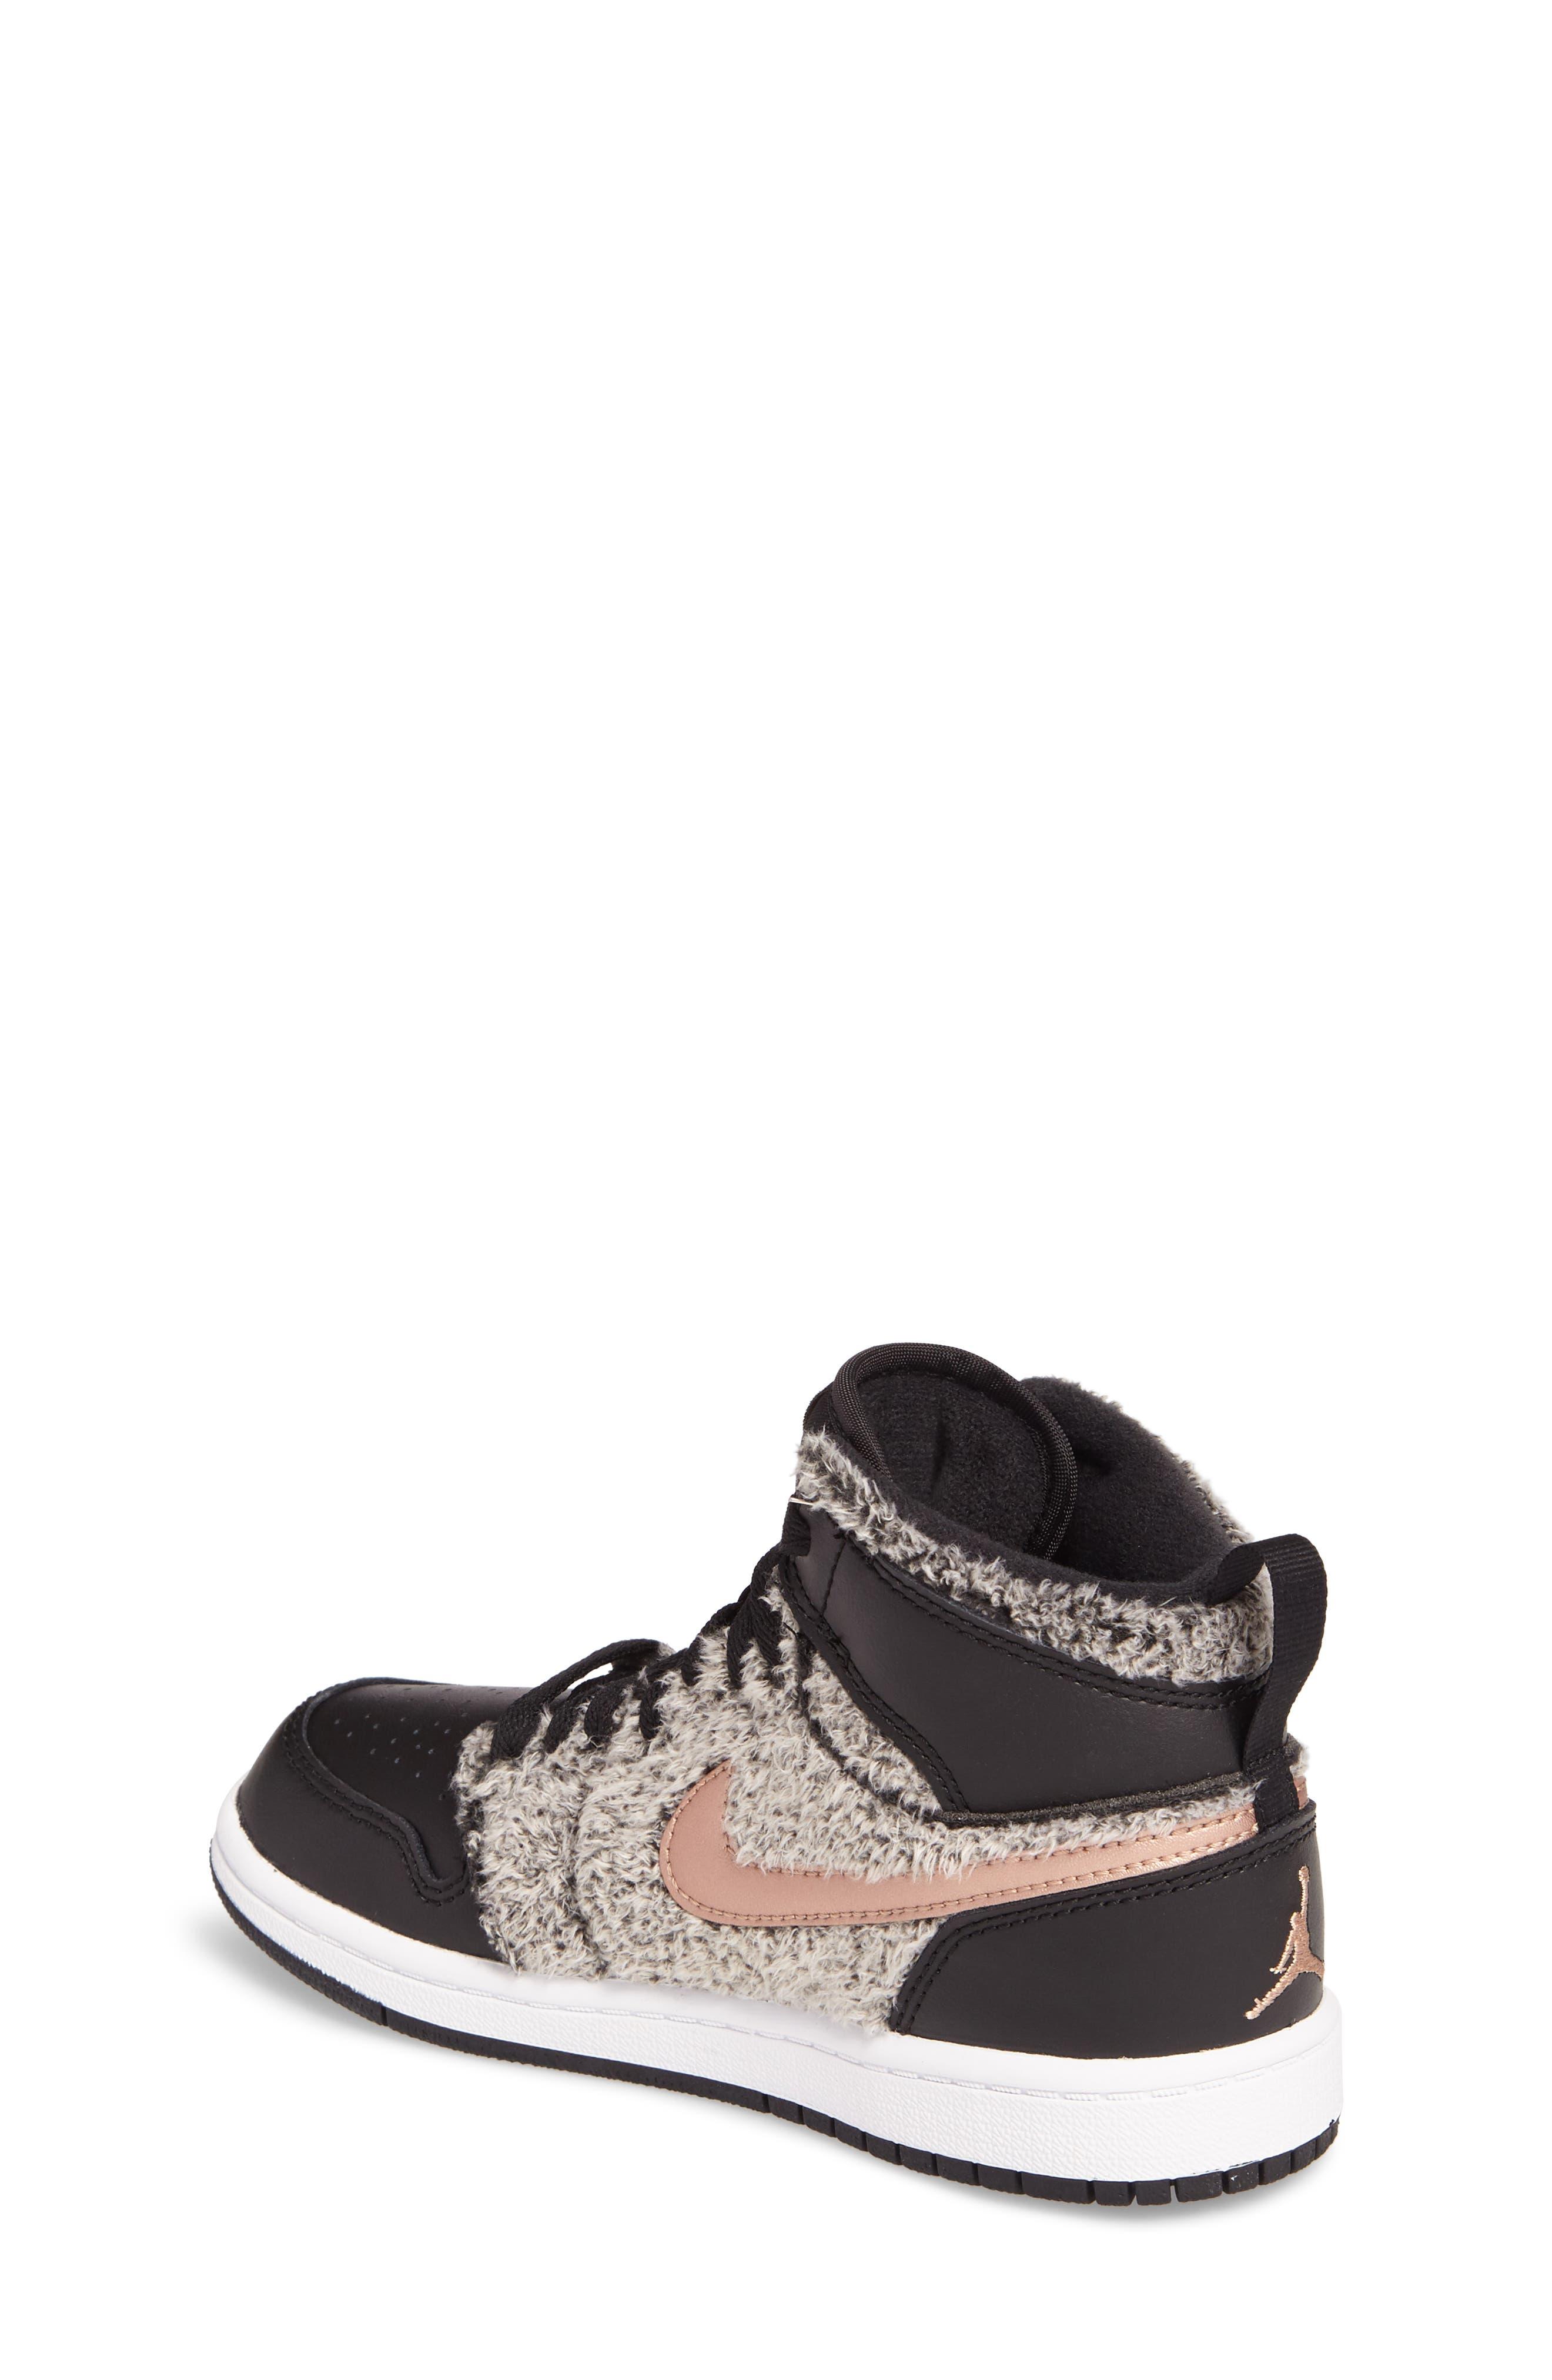 Alternate Image 2  - Nike Air Jordan 1 Retro Faux Fur High Top Sneaker (Toddler, Little Kid & Big Kid)